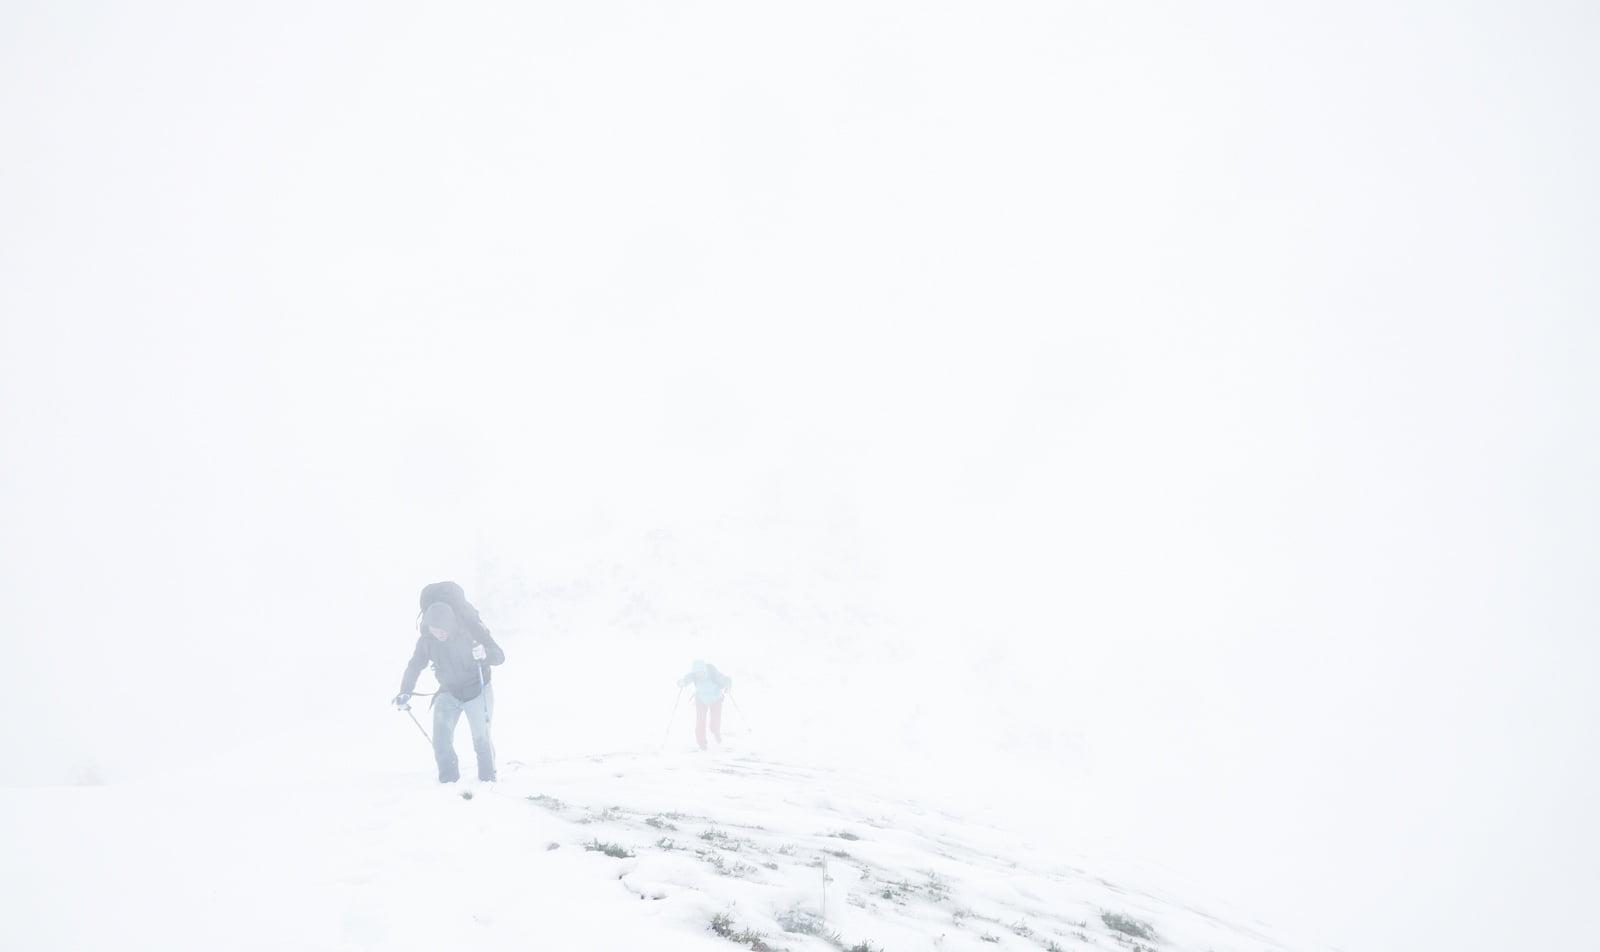 Winter storms in Norway